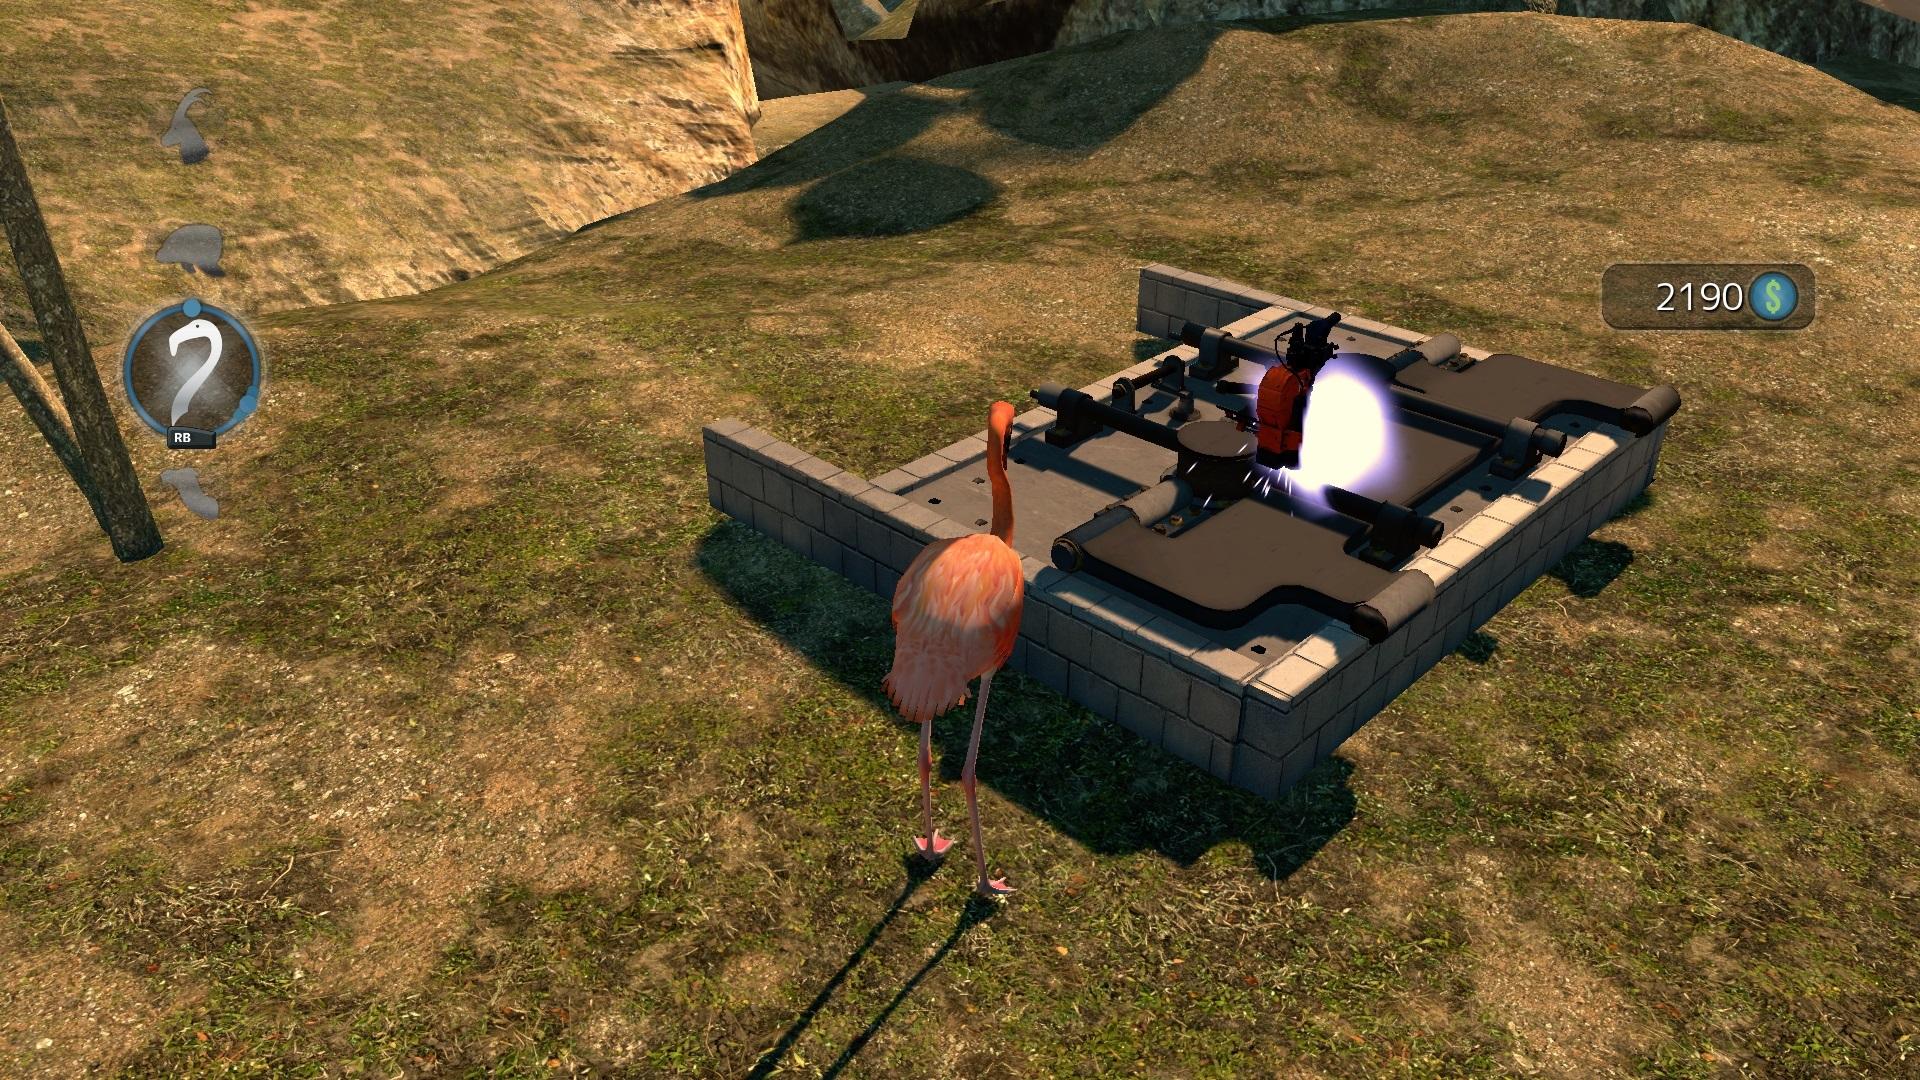 Goat_Simulator_Xbox_One_Payday_SS.jpg